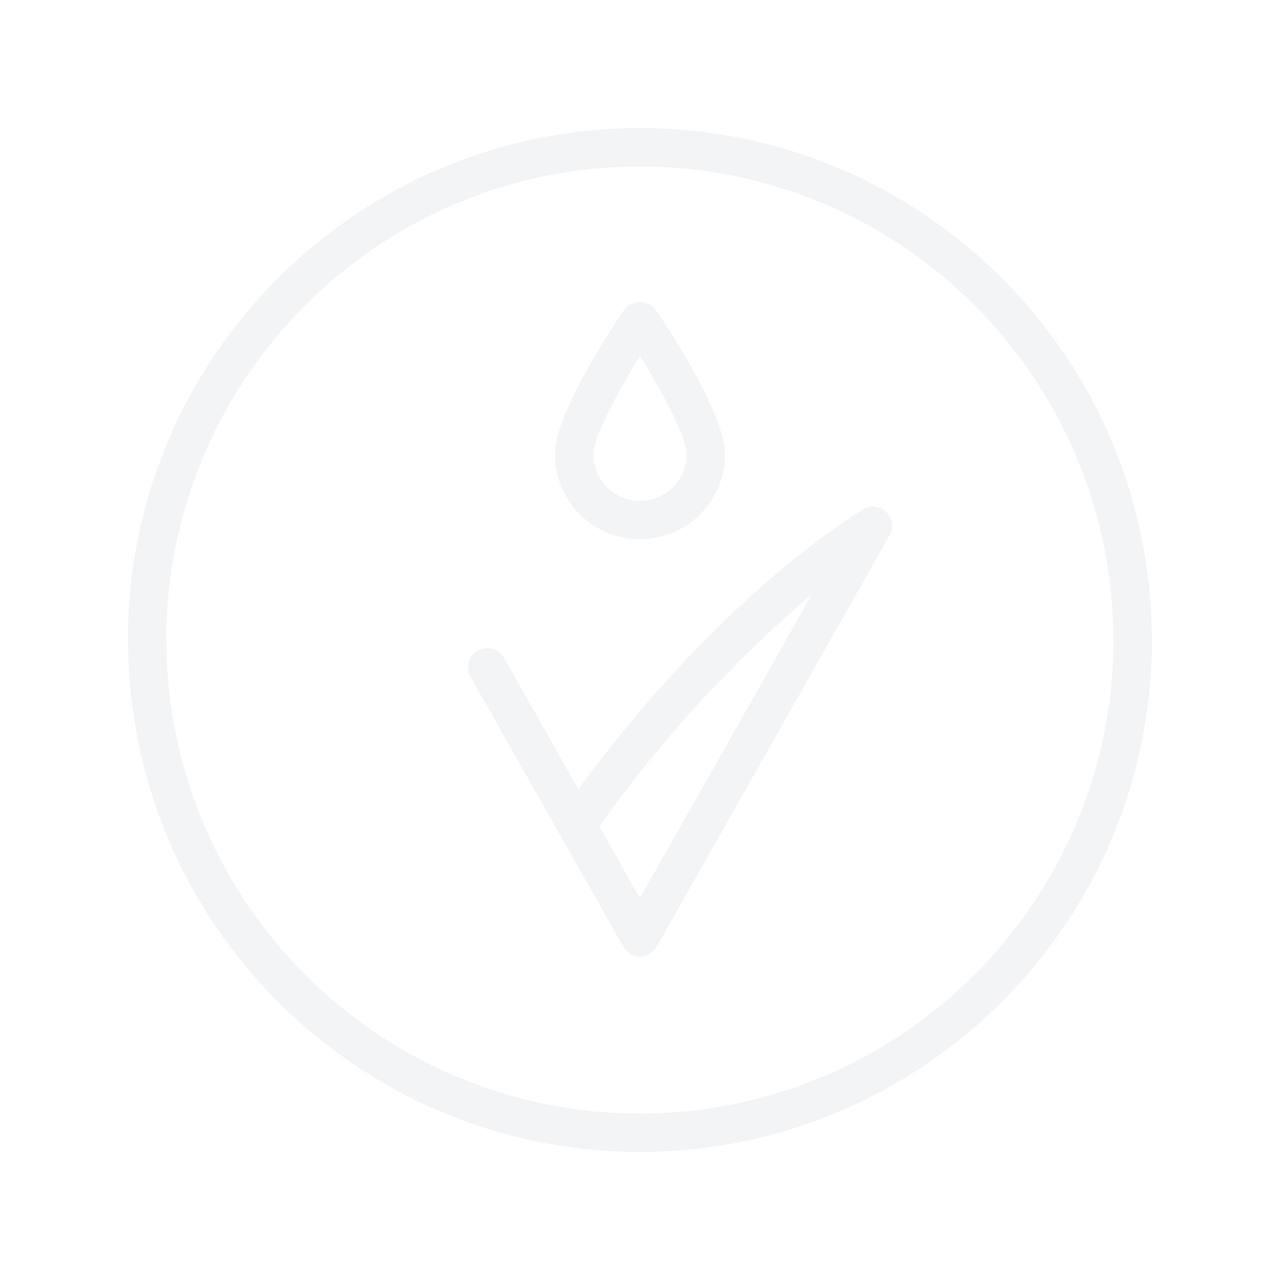 SESDERMA Mandelac Moisturizing Cream 50ml